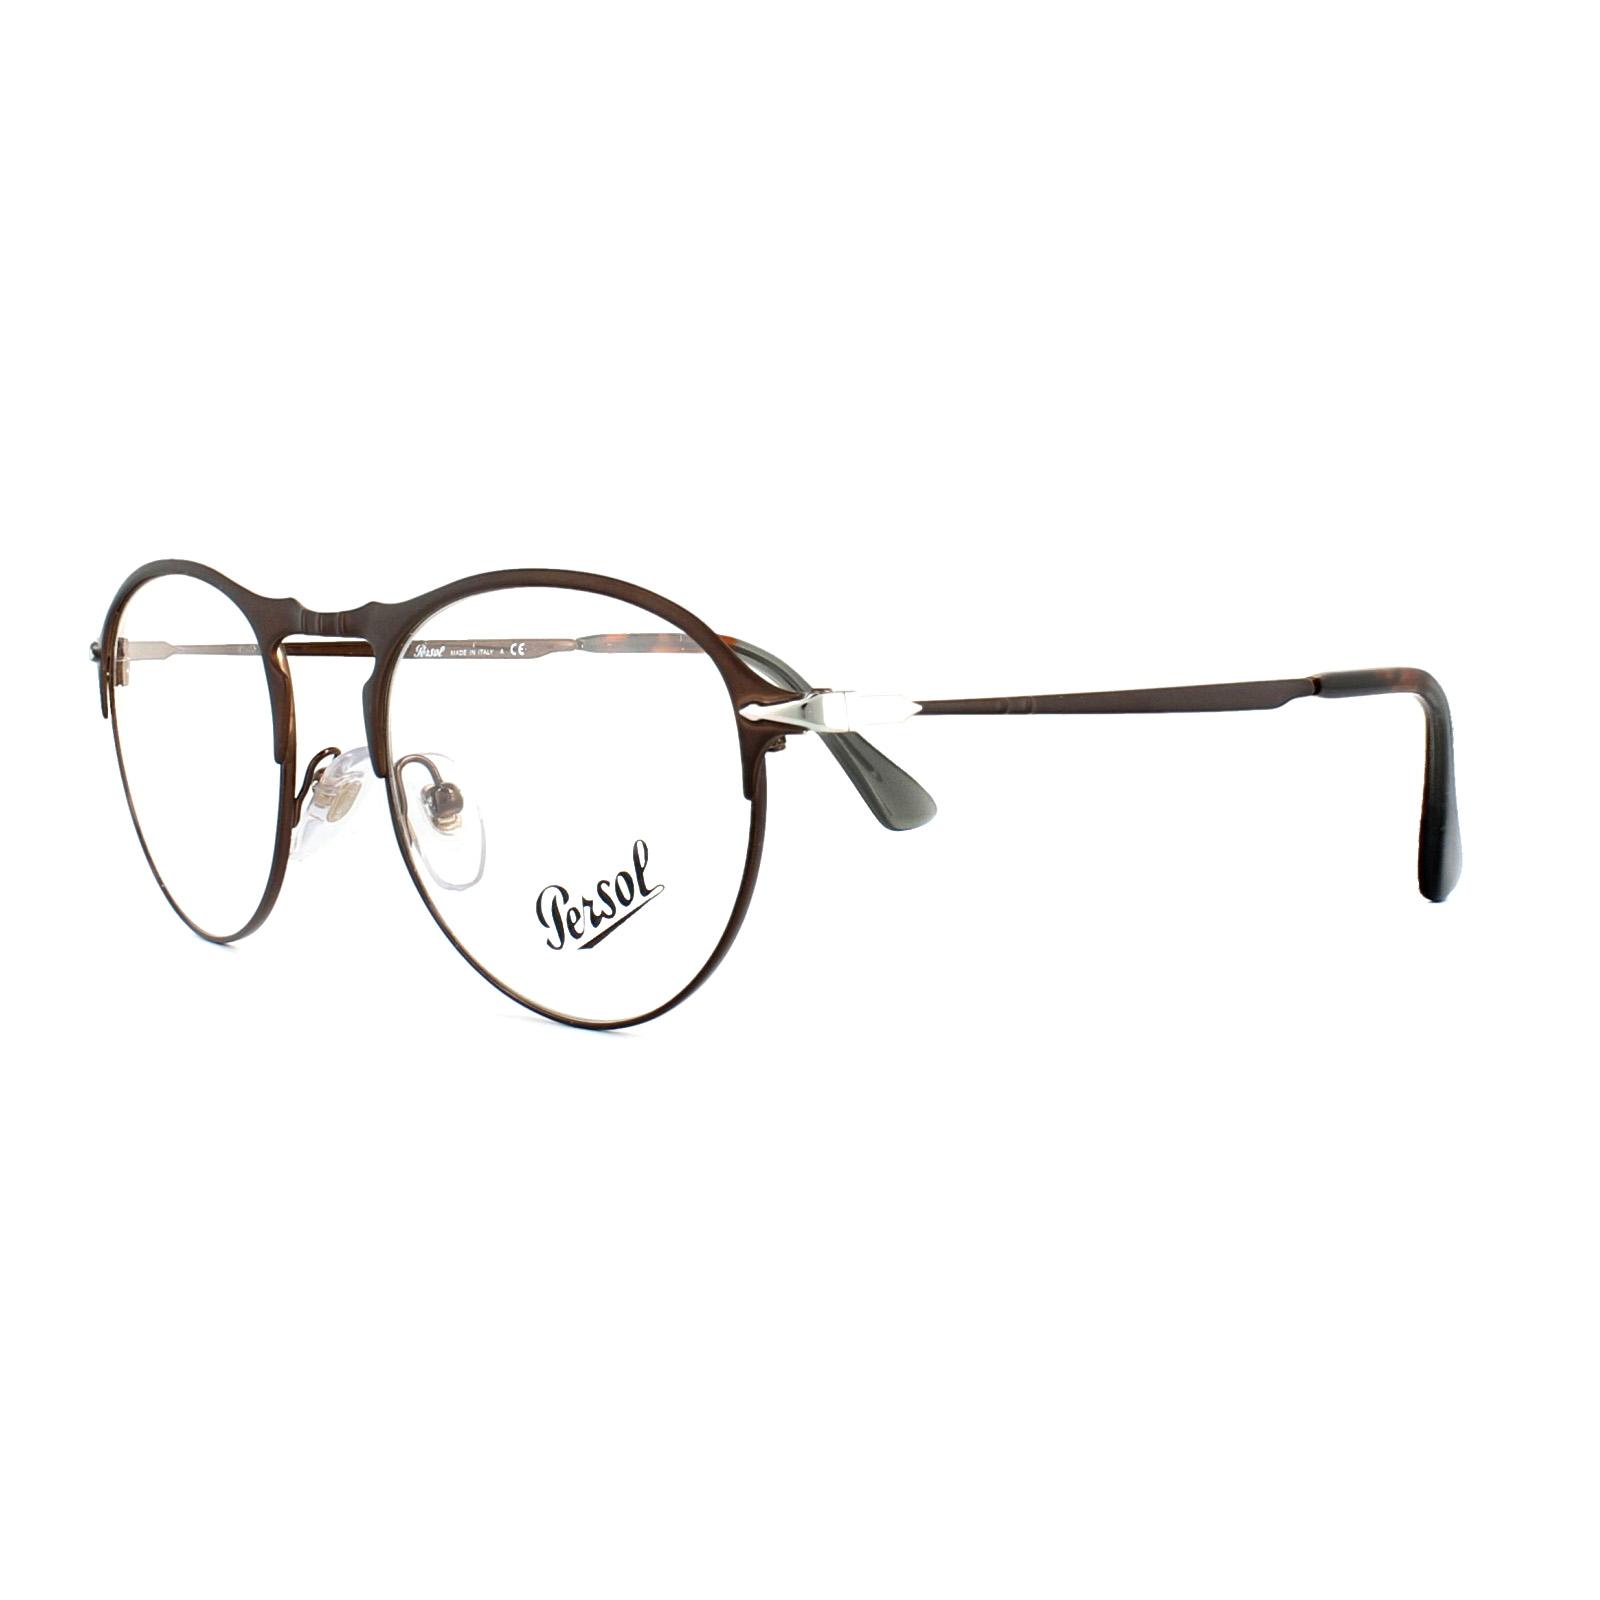 Persol Glasses Frames PO 7092V 1072 Matt Brown Mens 48mm ...